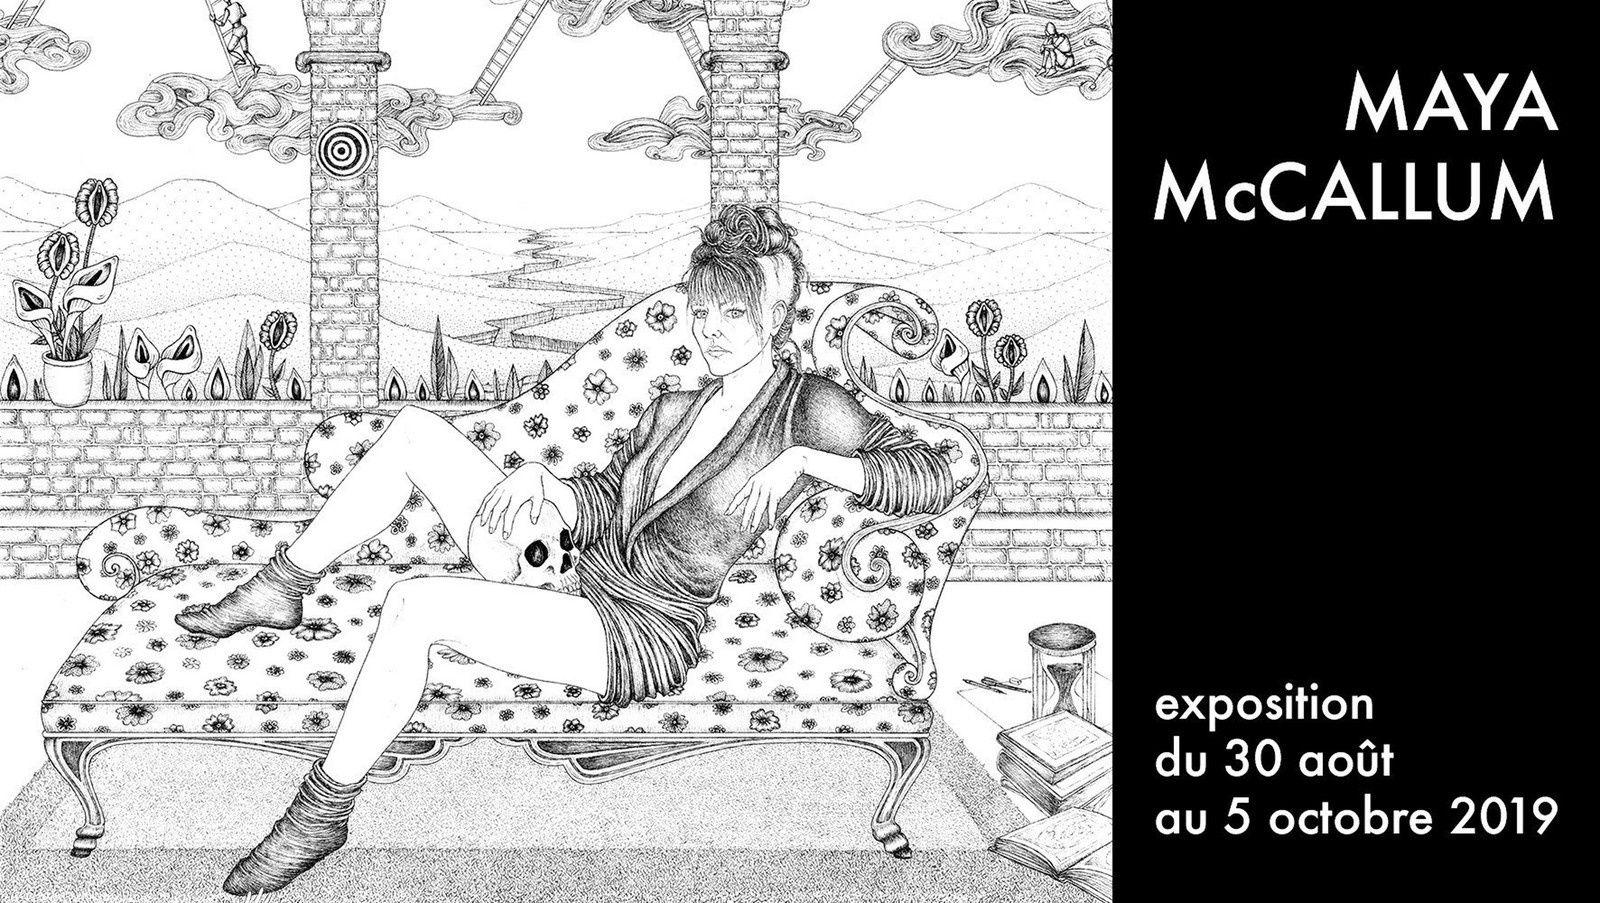 Exposition Collective Illustration Contemporaine: Maya Mc CALLUM, Frédéric VOISIN & Pat ANDREA